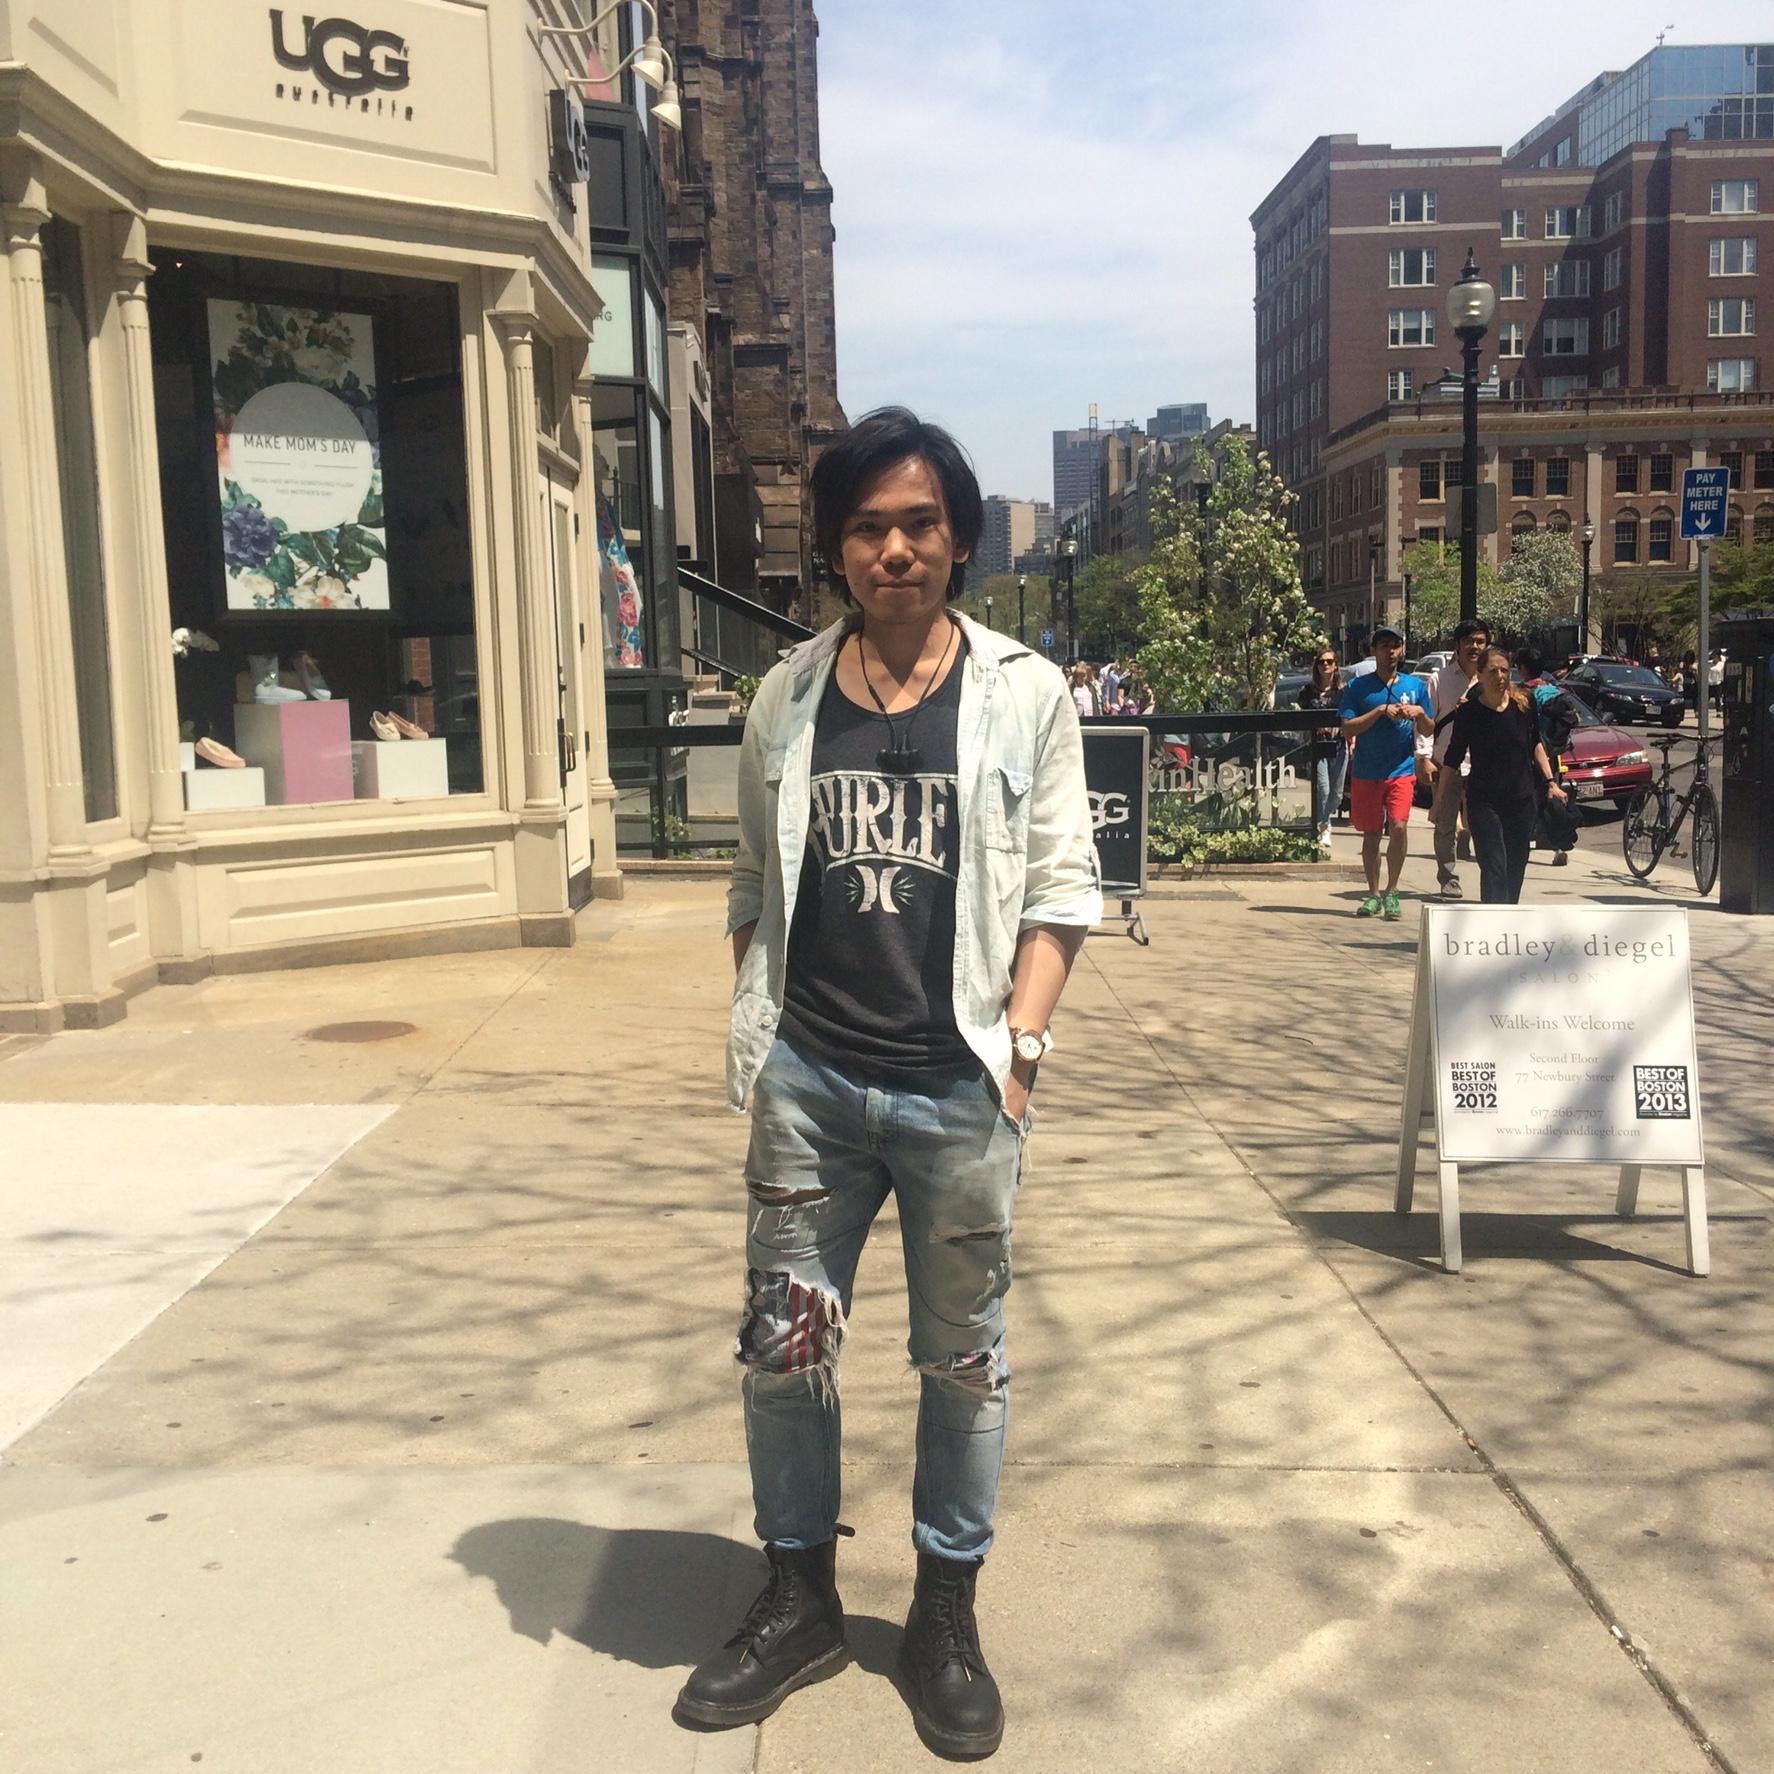 Weijun, The Rockstar